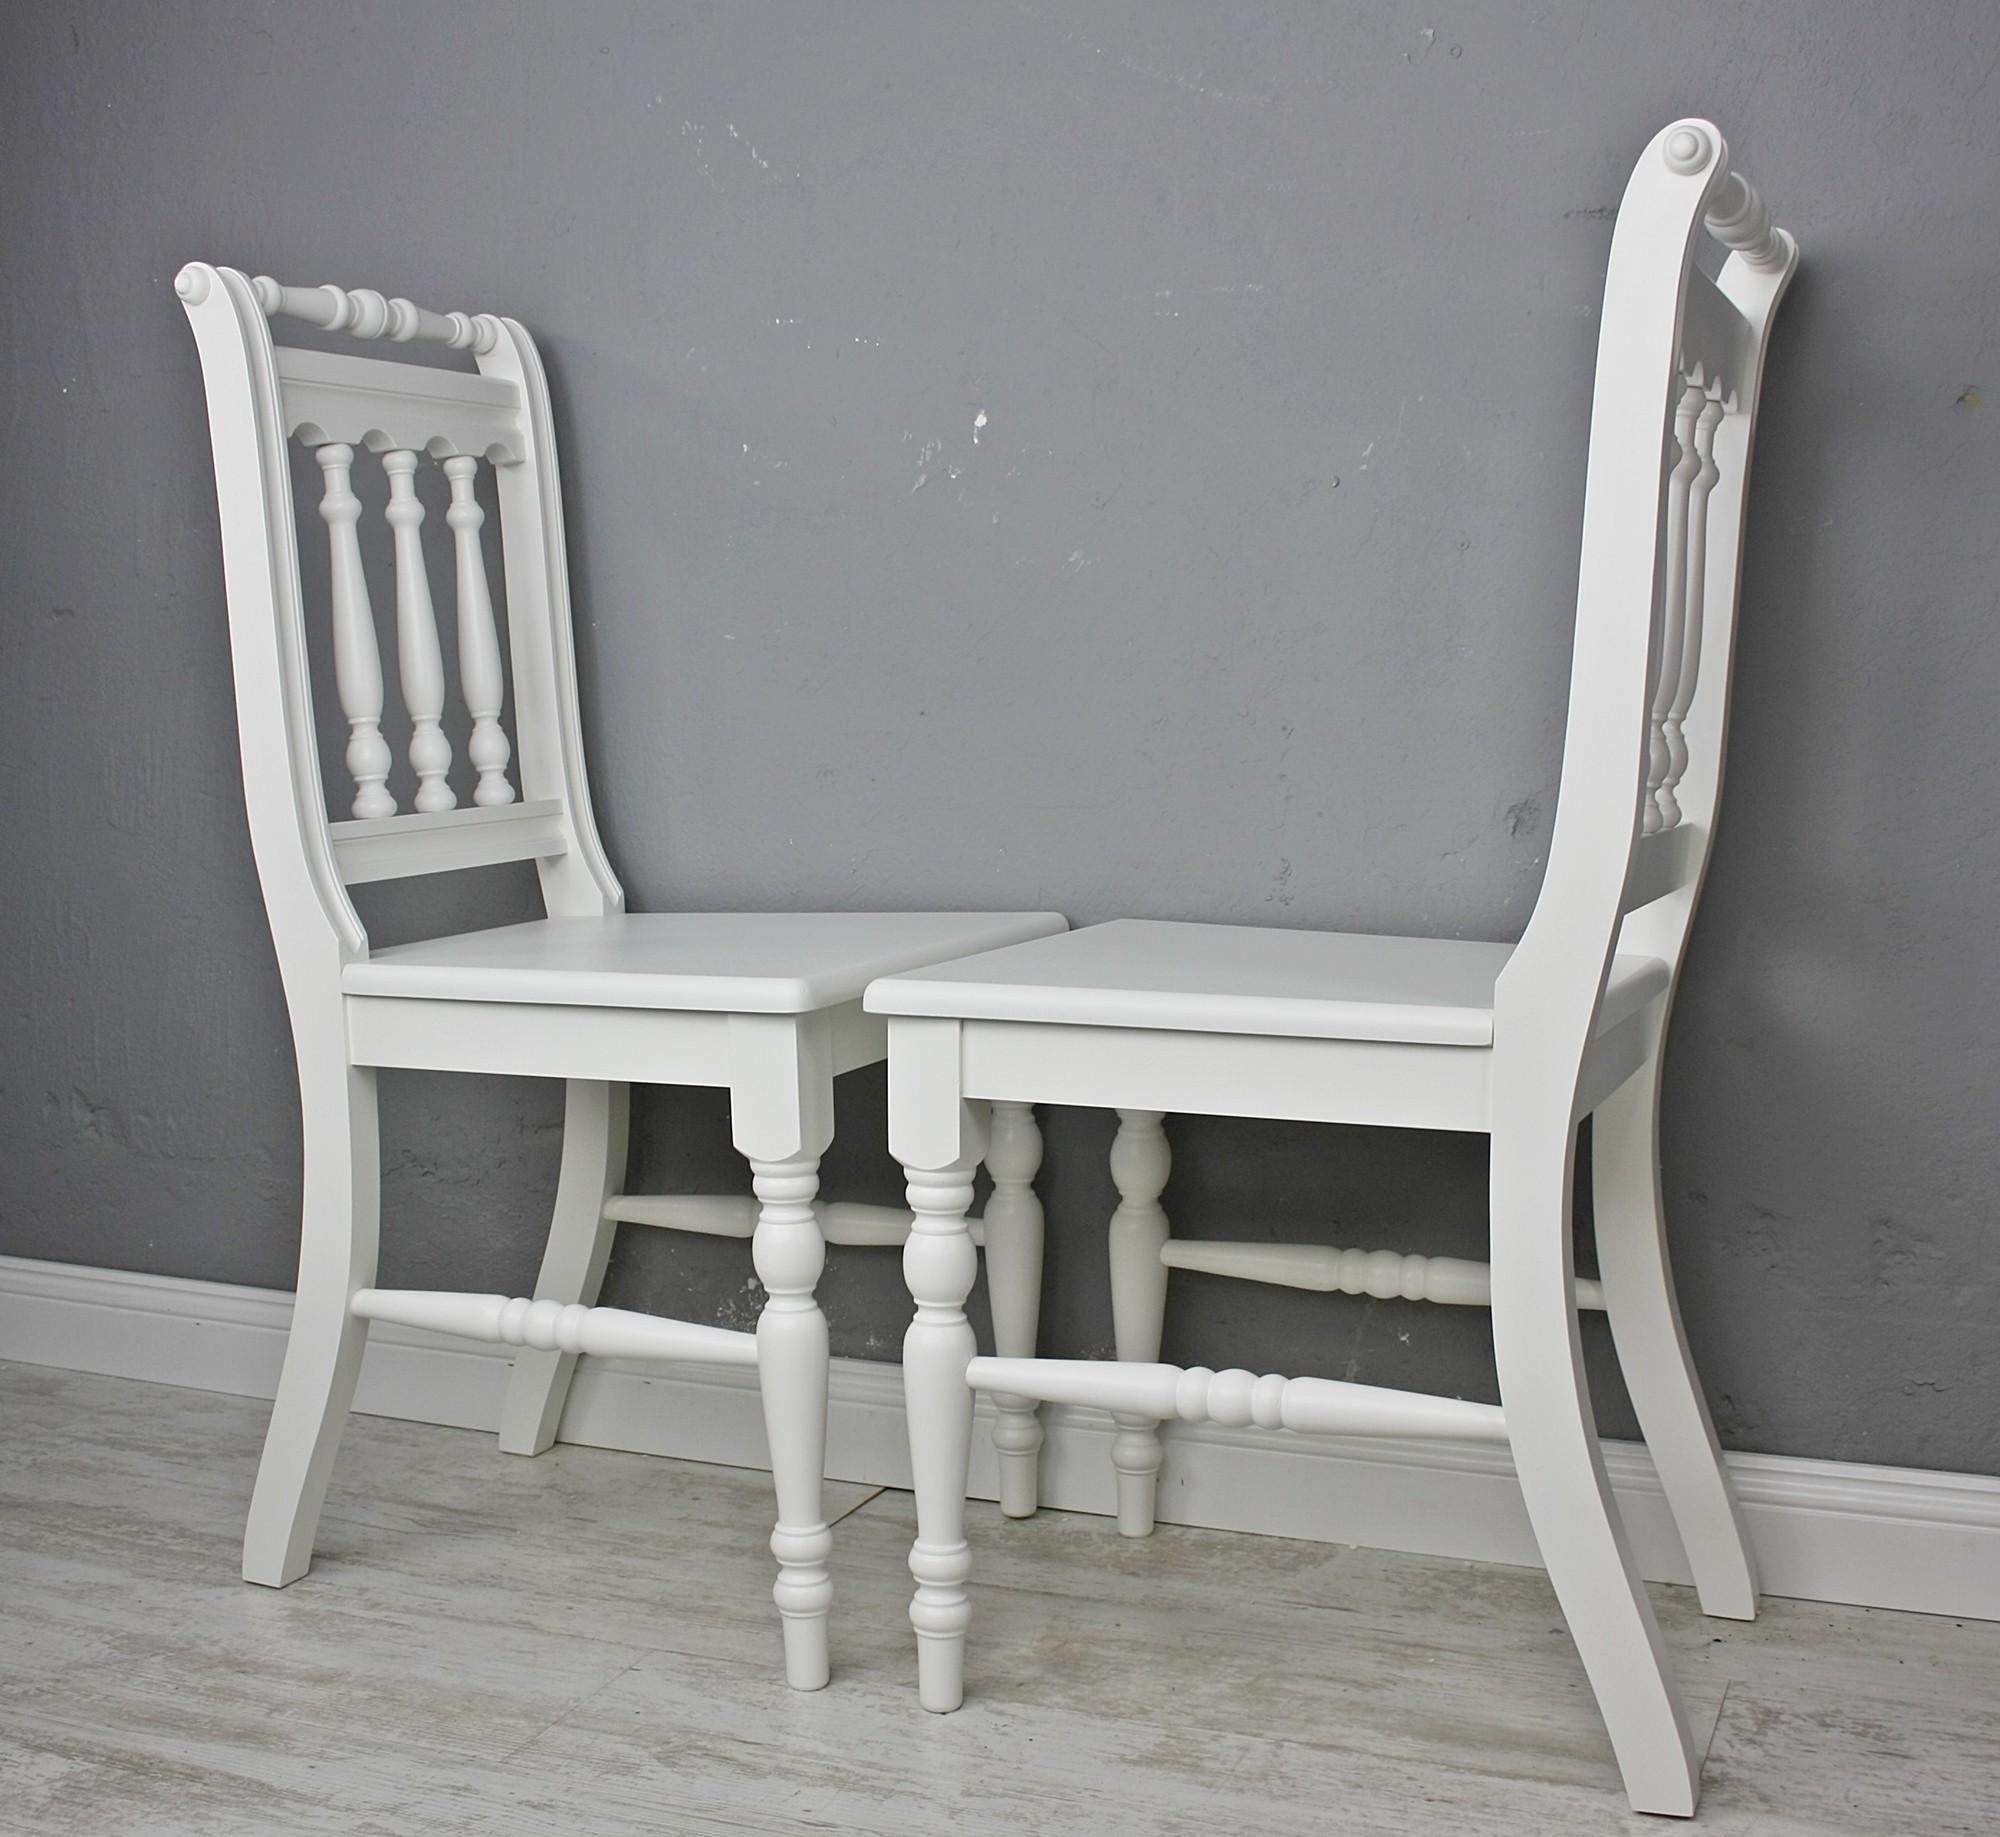 2x Stuhl Holzstuhl Küchenstuhl OTTO Massiv Weiß Vollholz